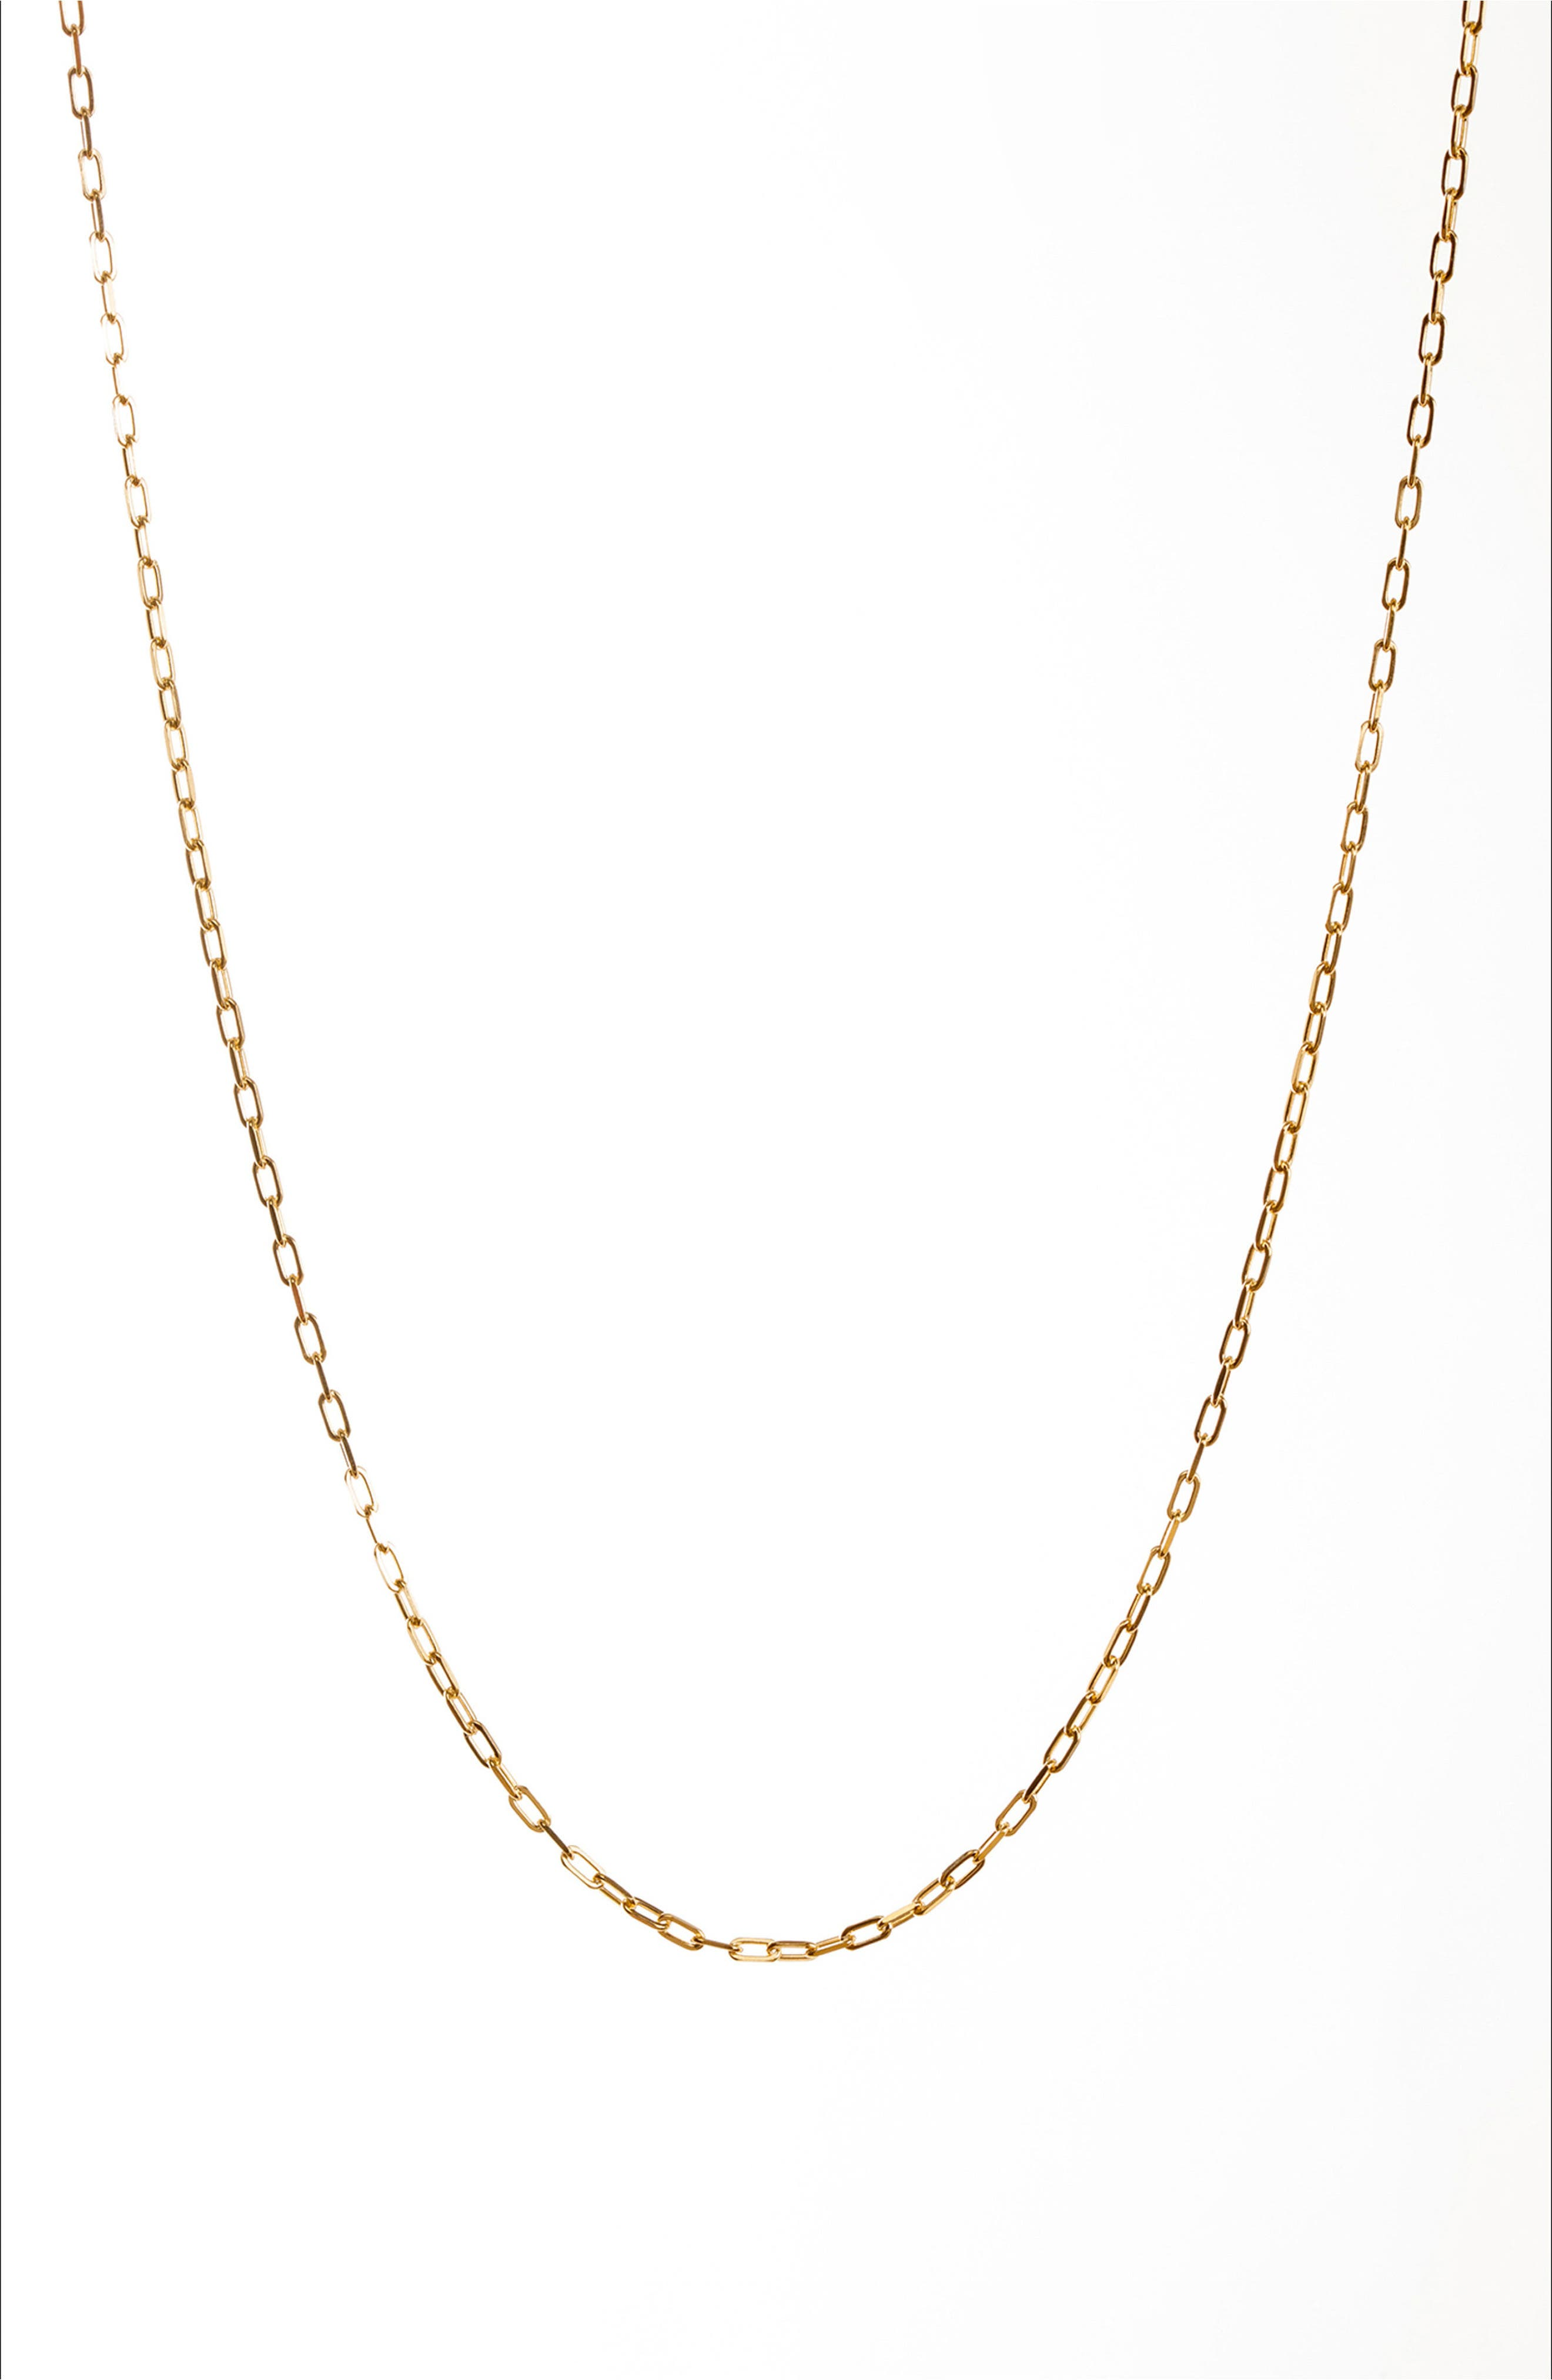 Petalbox Link Necklace,                             Alternate thumbnail 6, color,                             Gold